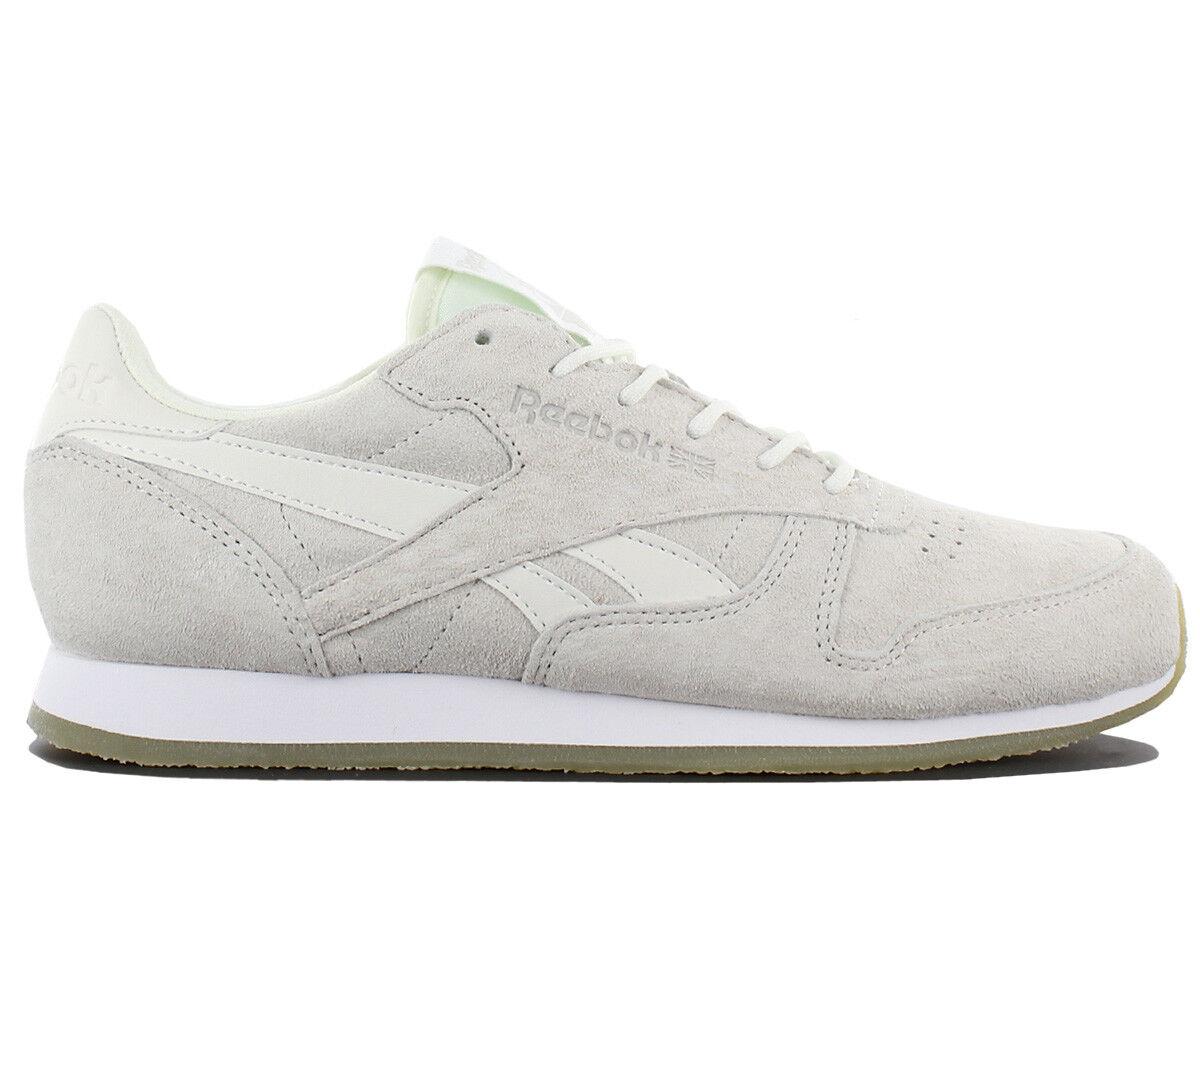 Reebok Classic Leather Crepe Sail Away Ladies Sneaker shoes Bd3017 Rbk Cl Lthr